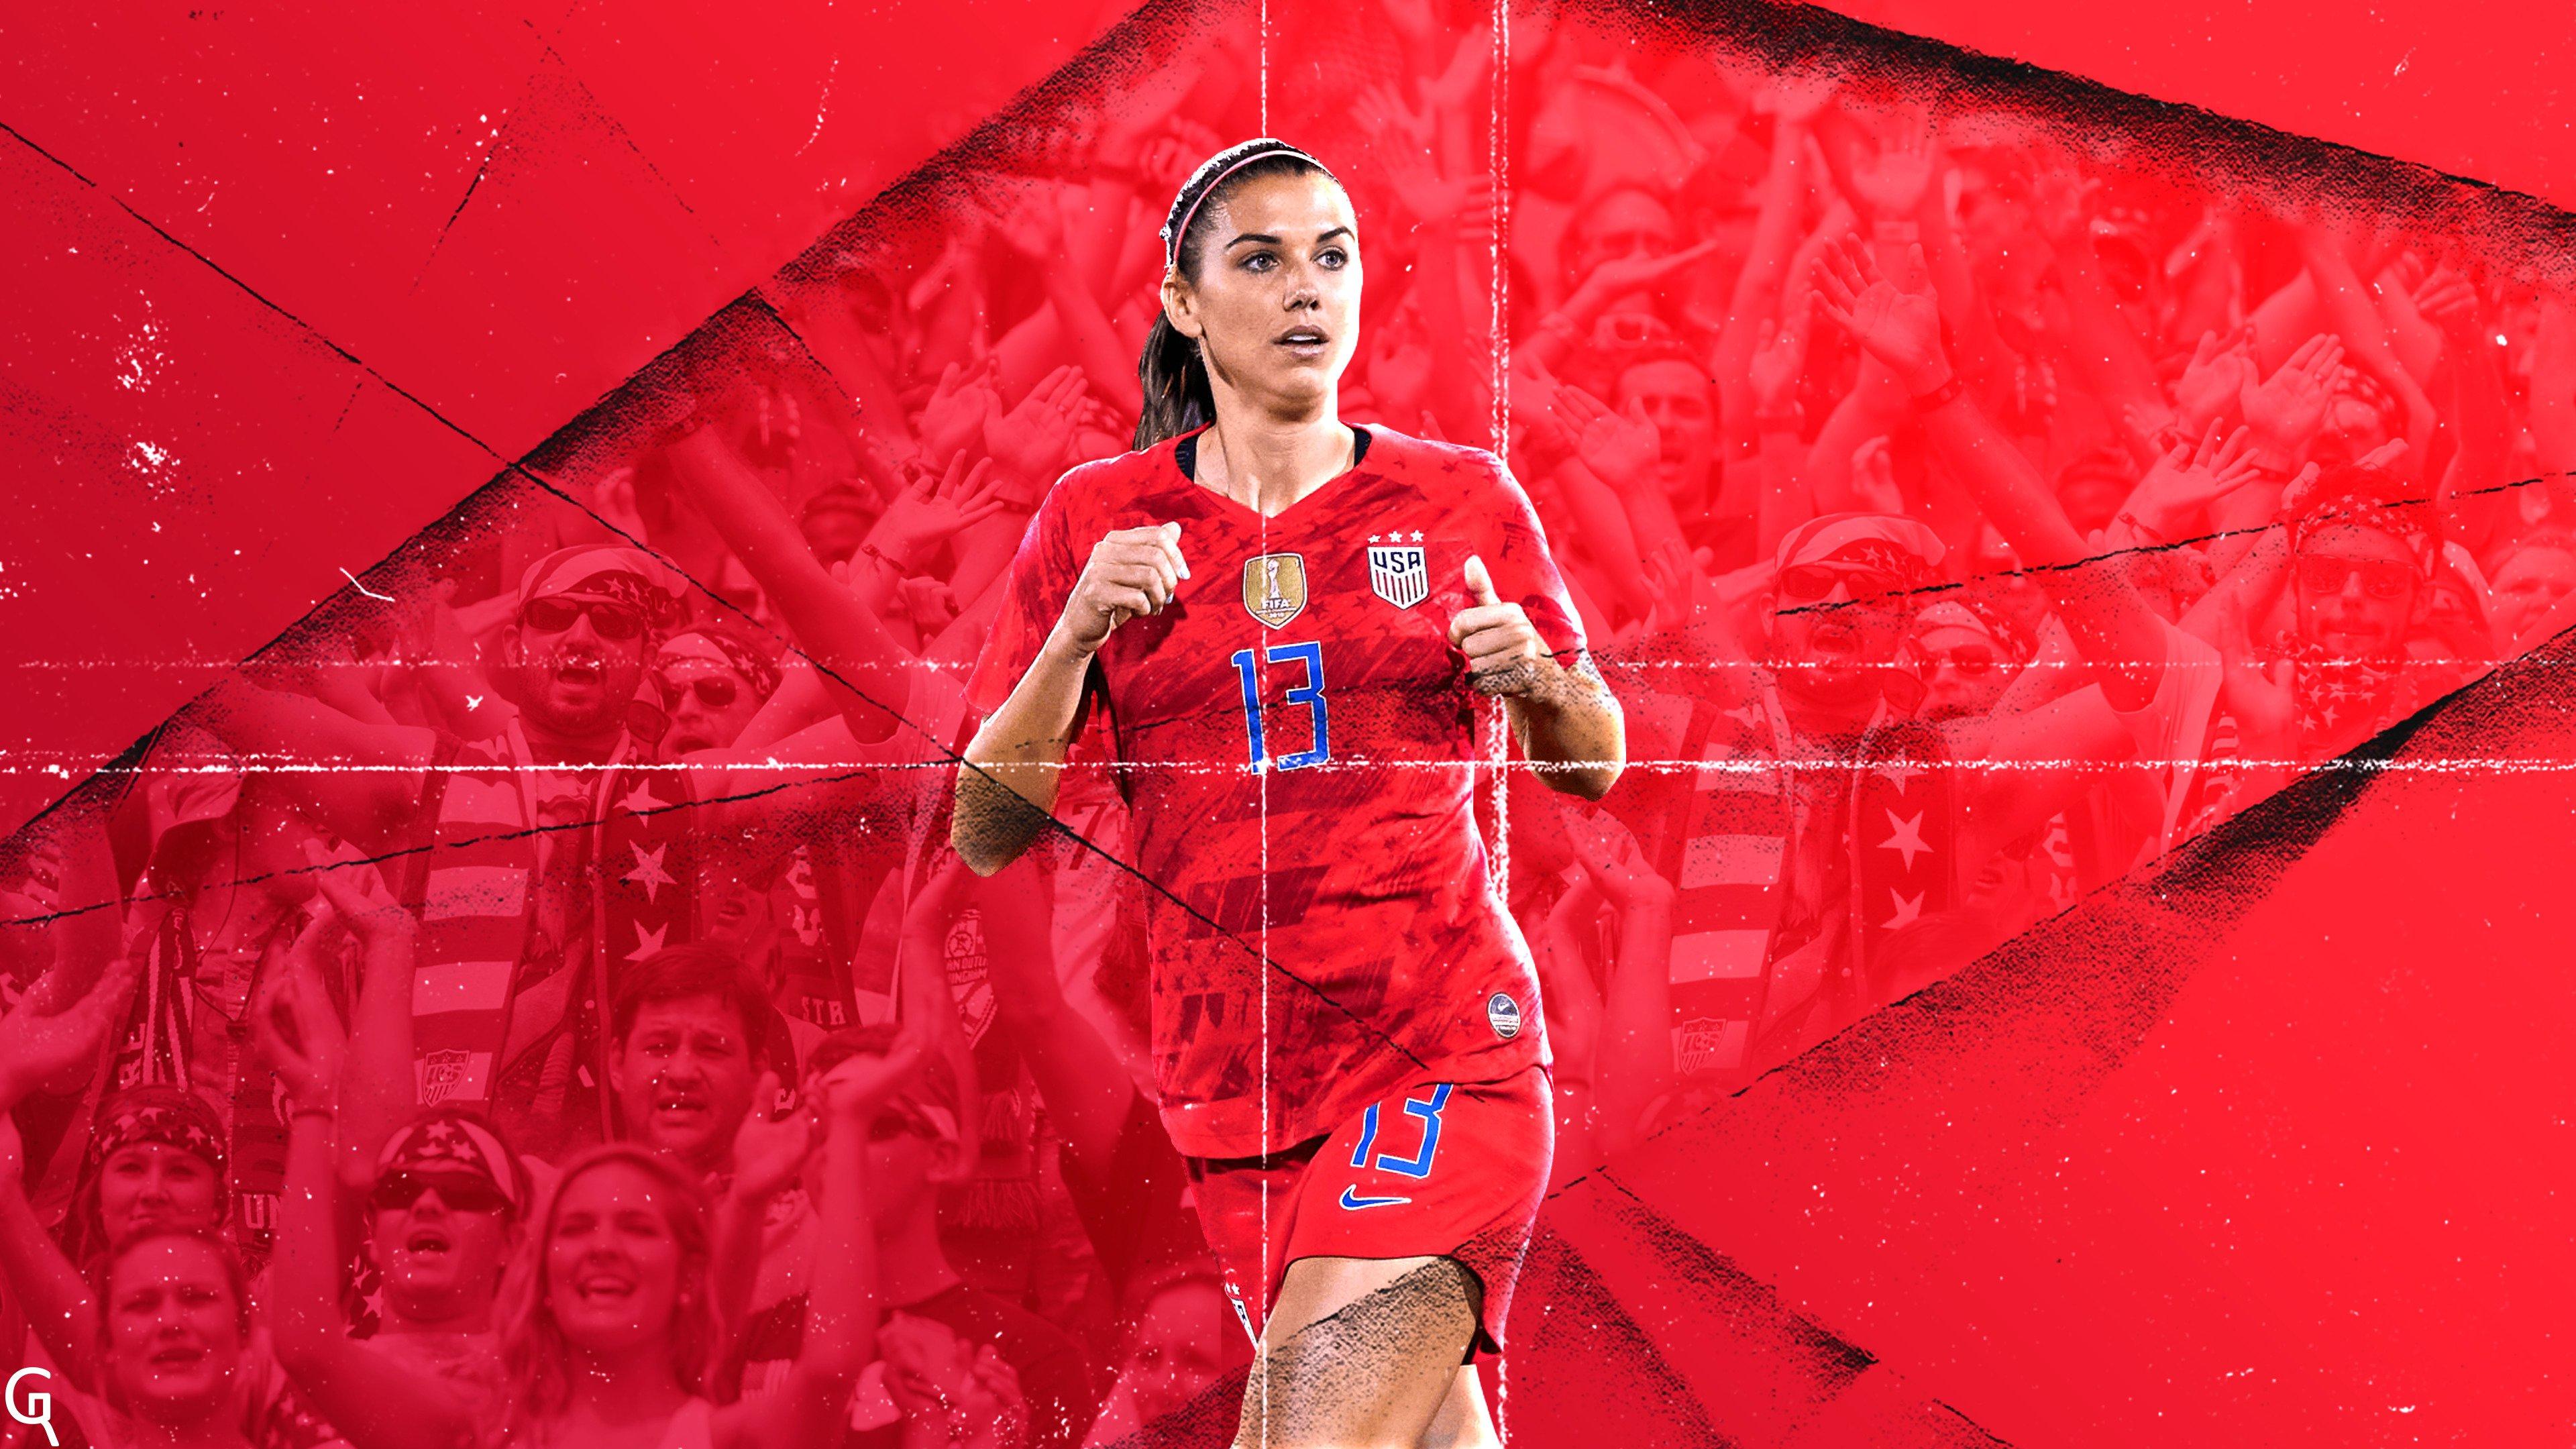 Sport Wallpaper Iphone 6 Plus: 1080x1920 Alex Morgan 2019 Iphone 7, 6s, 6 Plus And Pixel